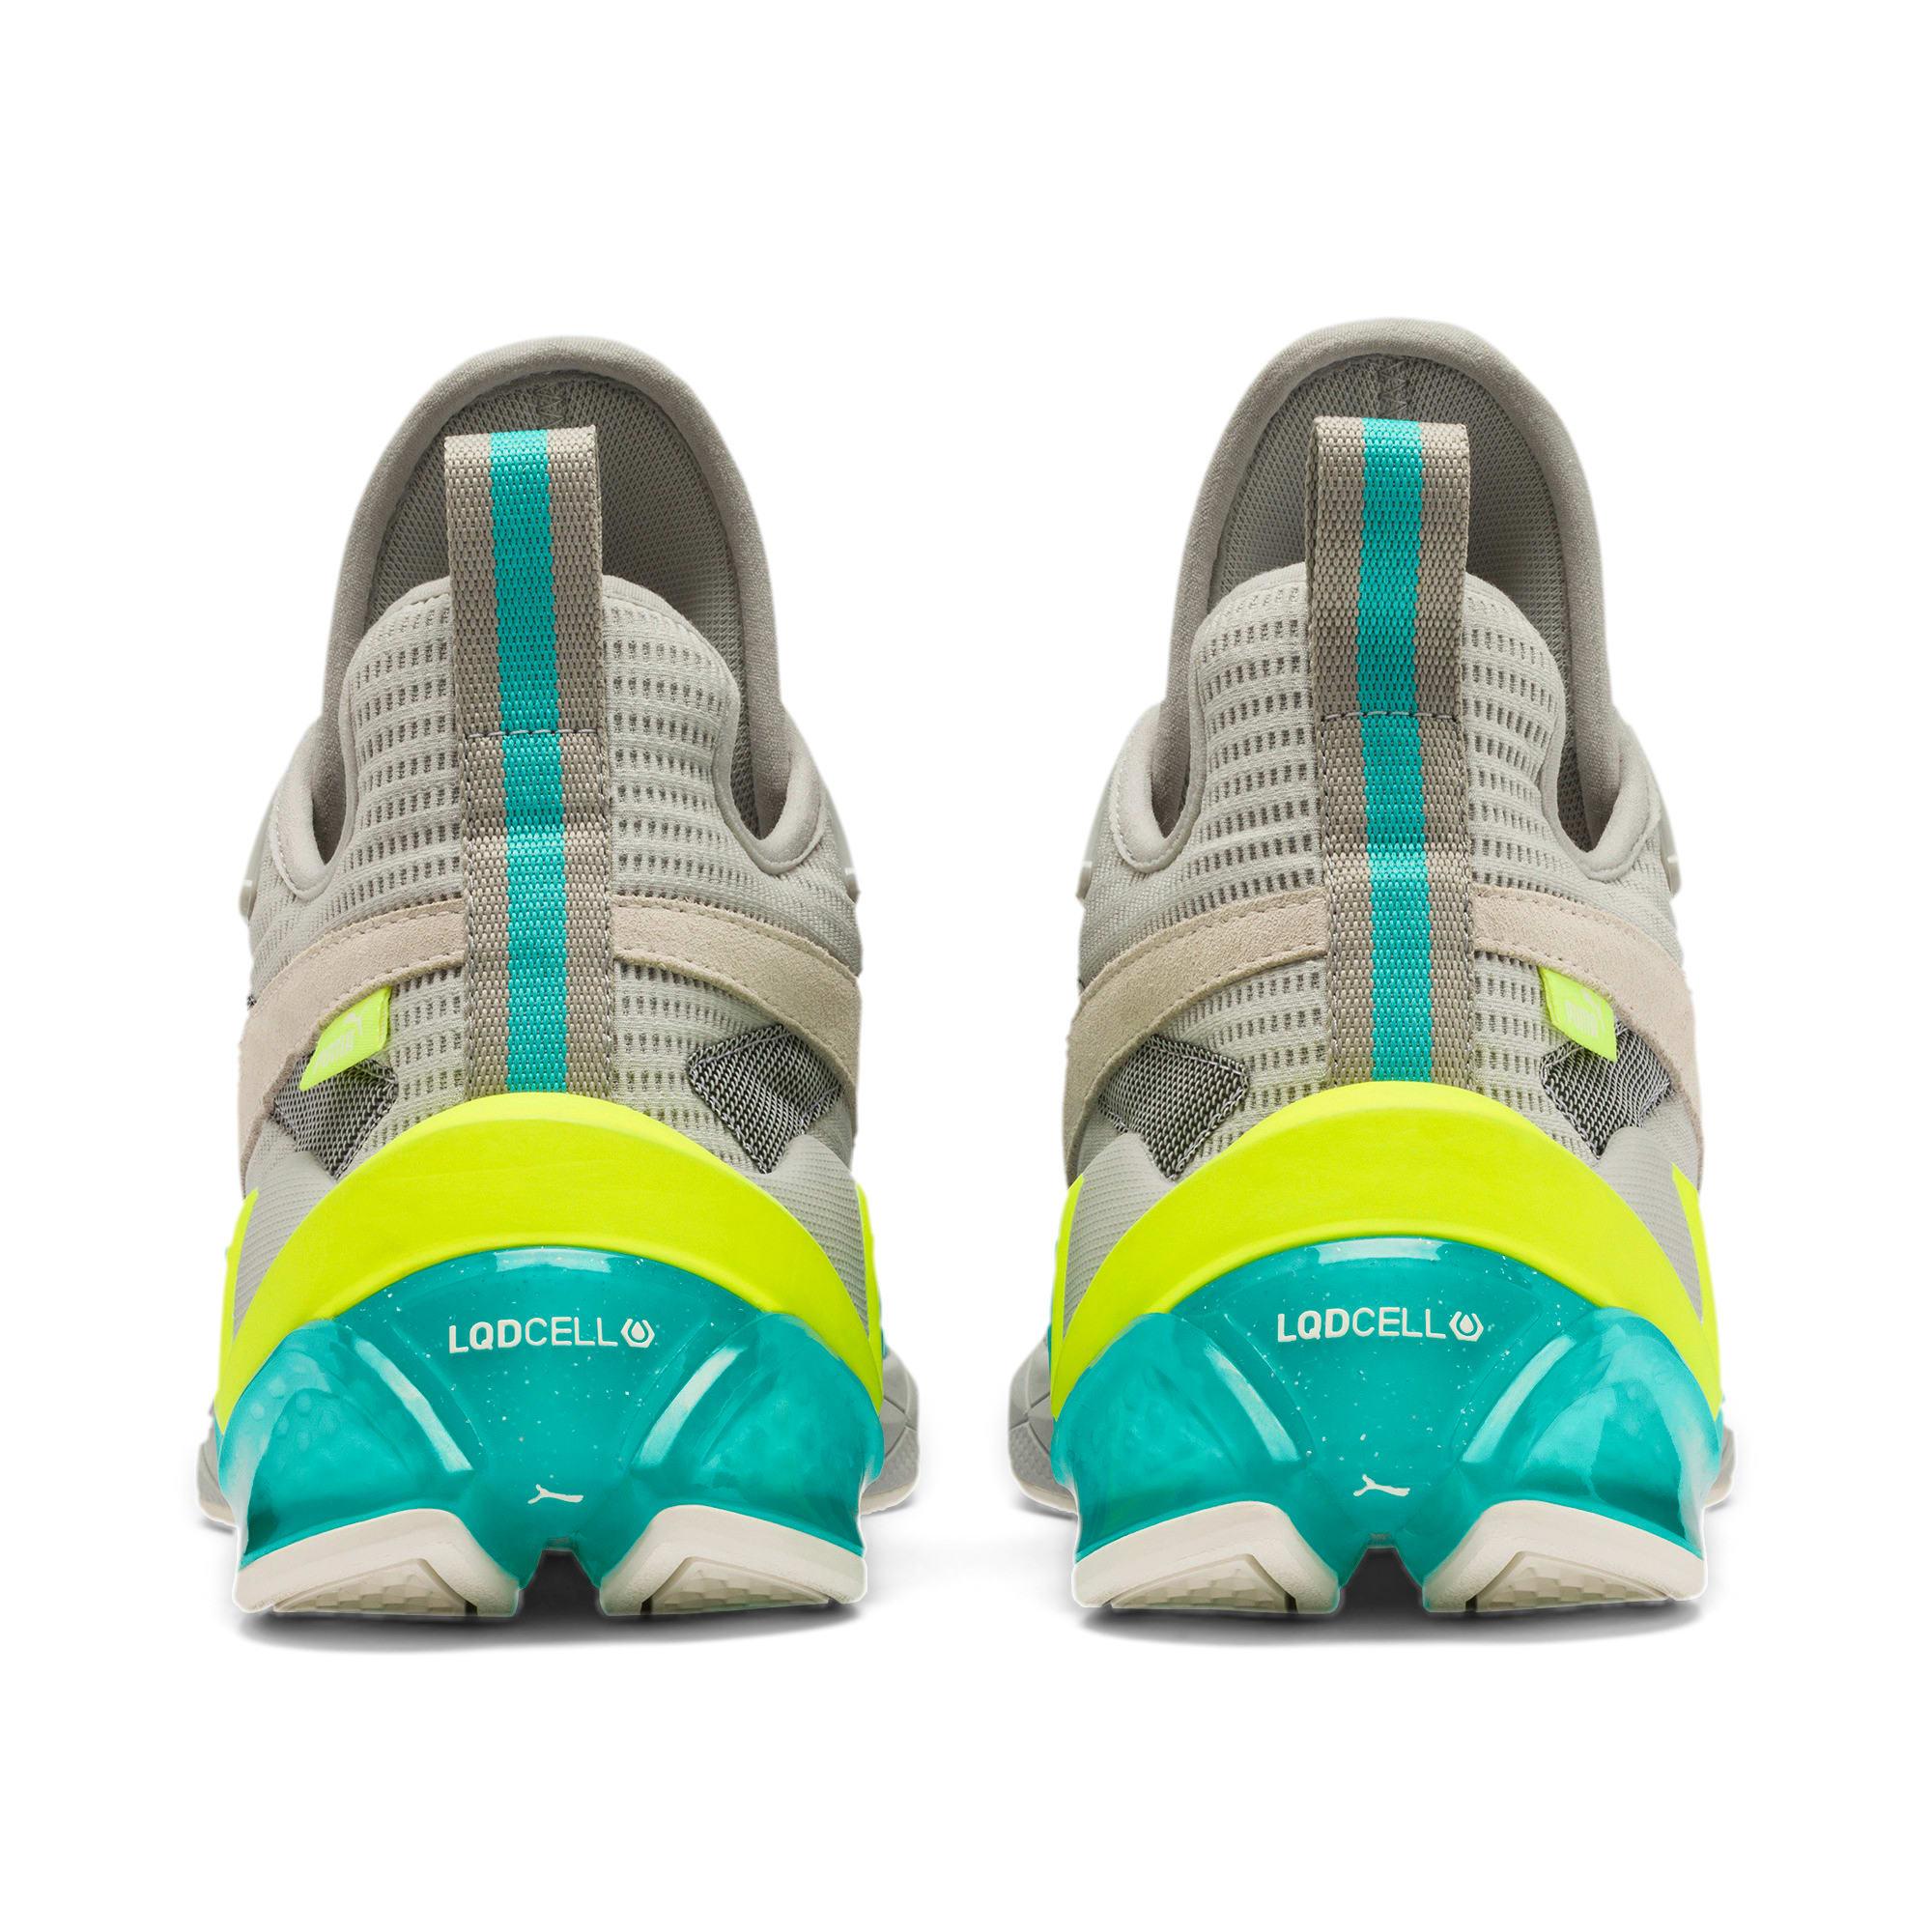 Thumbnail 4 of LQDCELL Origin Men's Training Shoes, High Rise-Blue Turquoise, medium